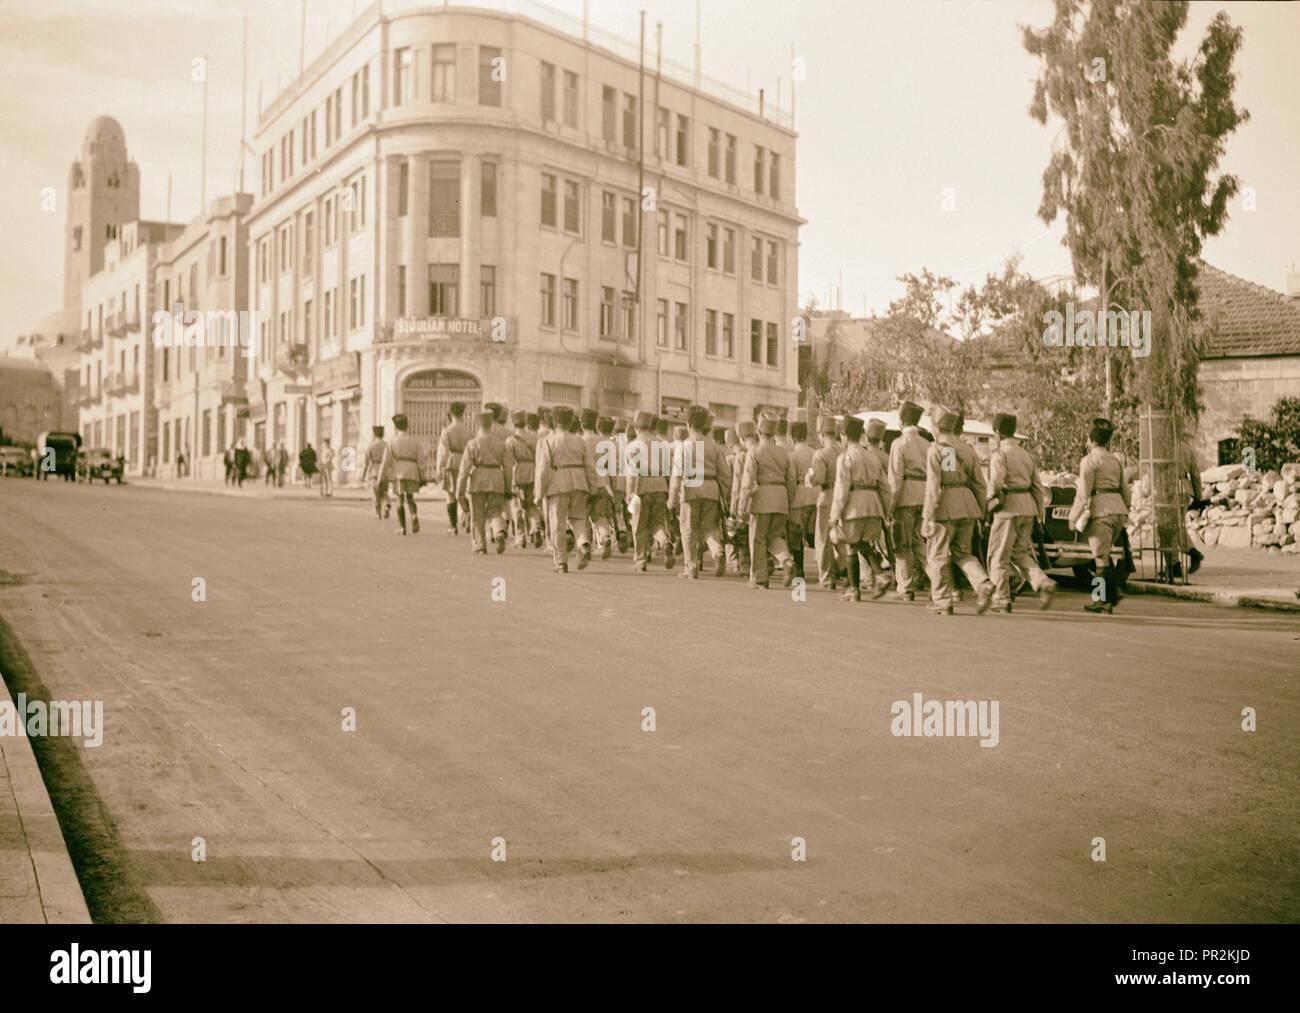 Jewish Supernumerary Police, line of about 50 men marching on Julian Way, Nov. 5, 1938, Jerusalem, Israel - Stock Image